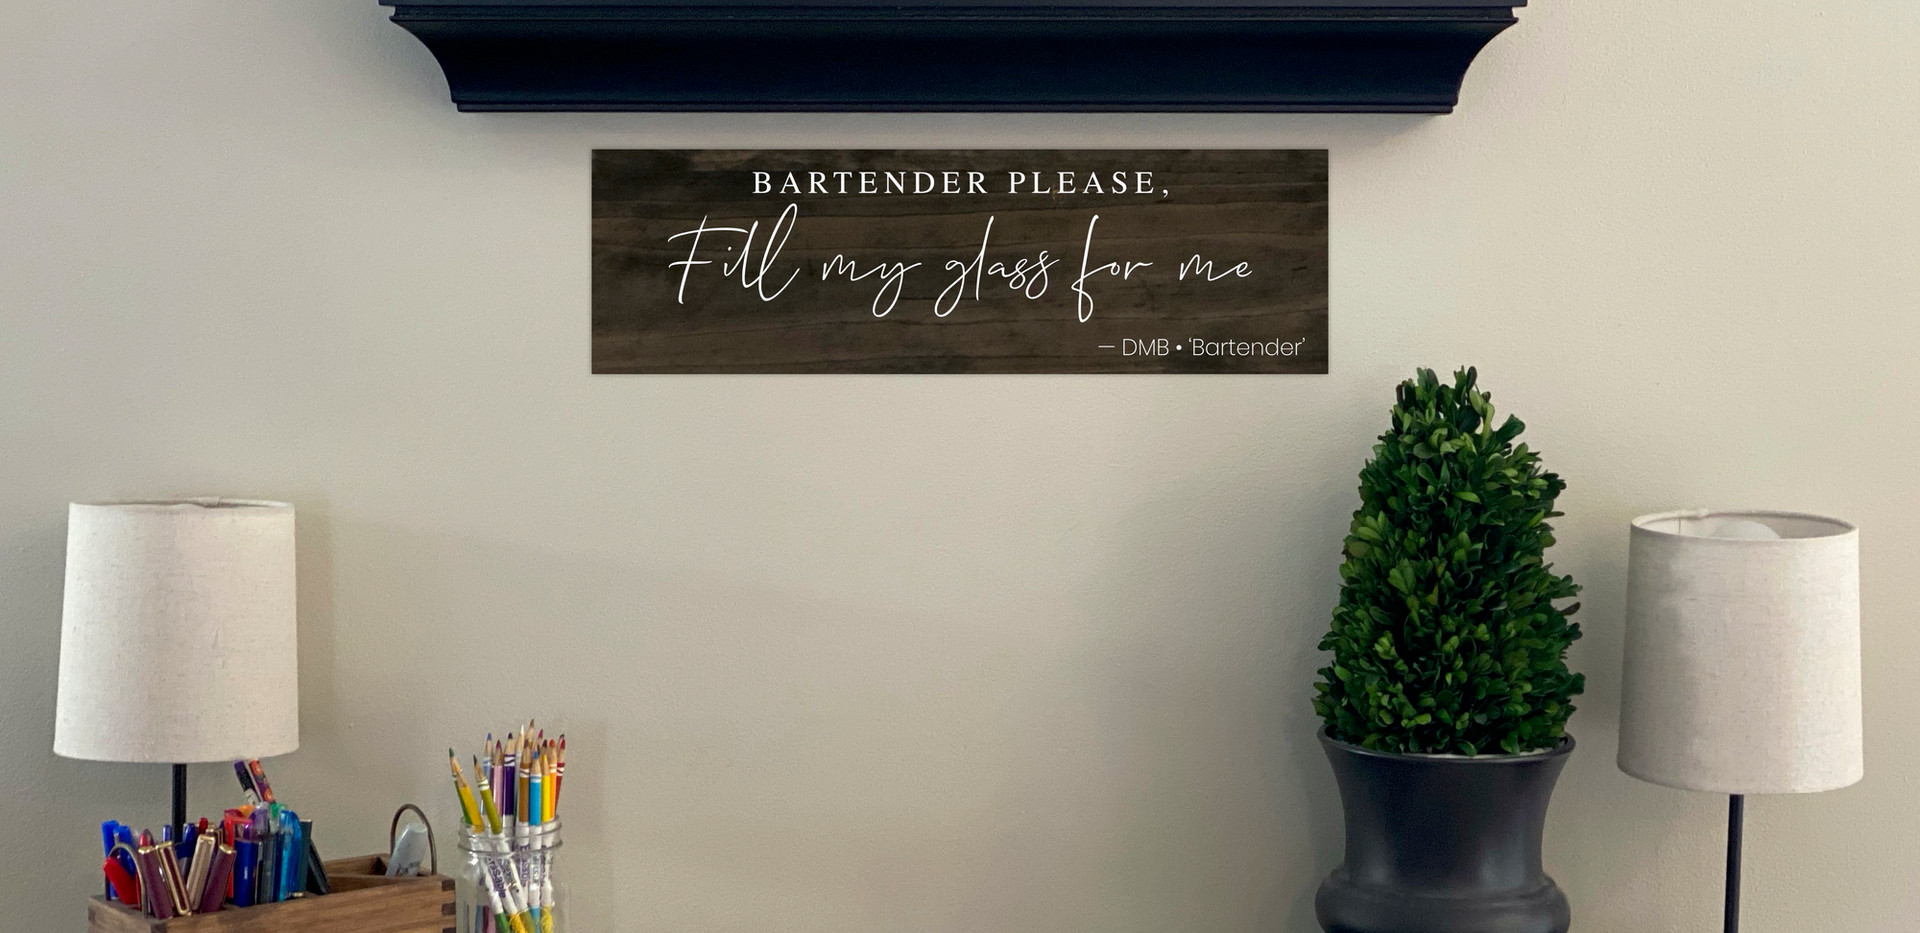 Bartender In-Layout.jpg